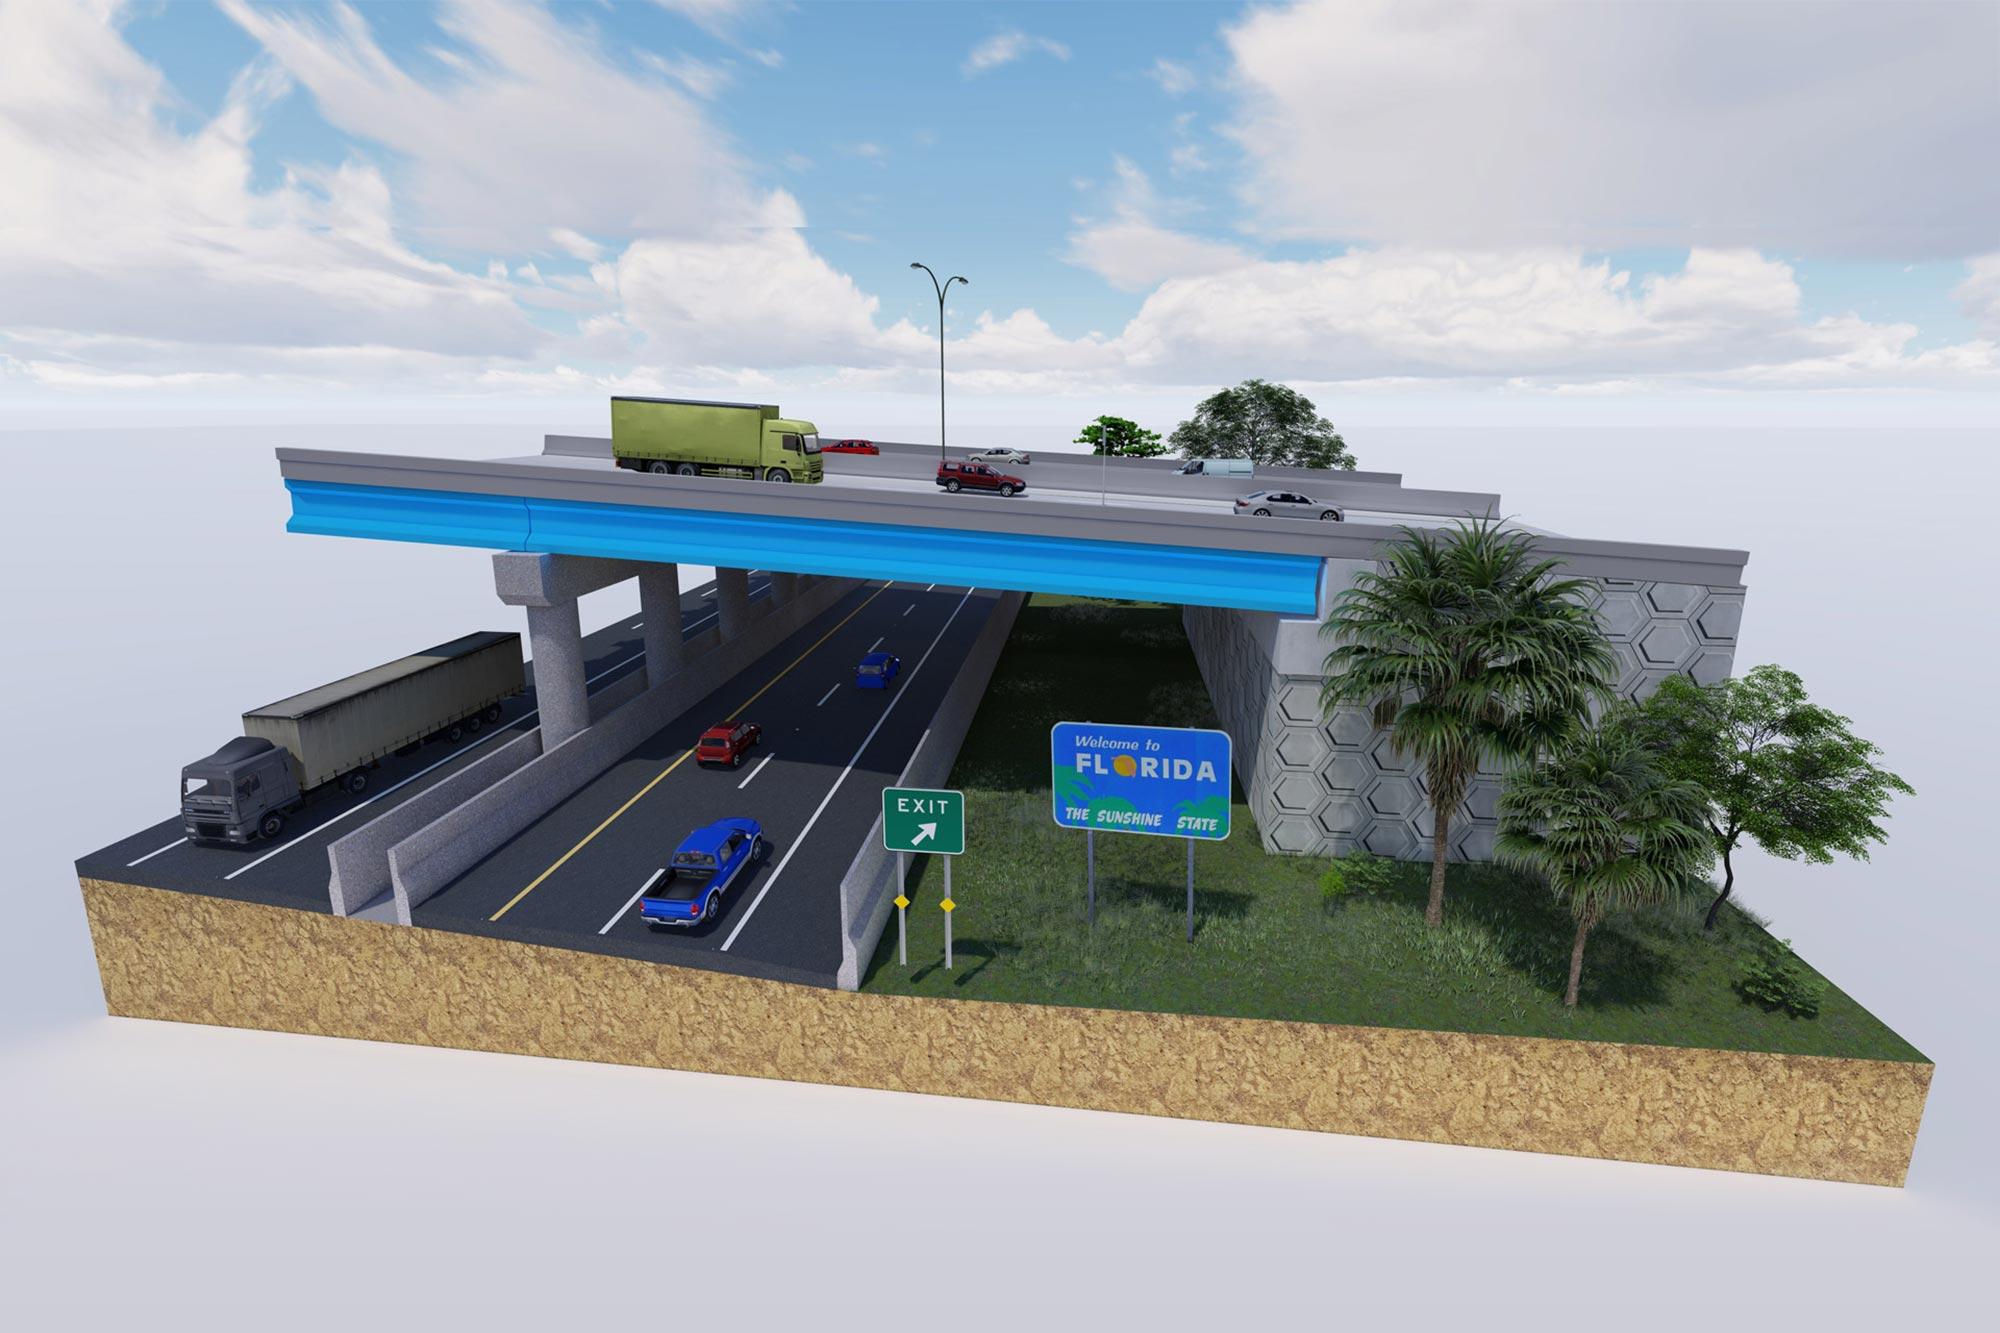 SR 826 EB to I-95